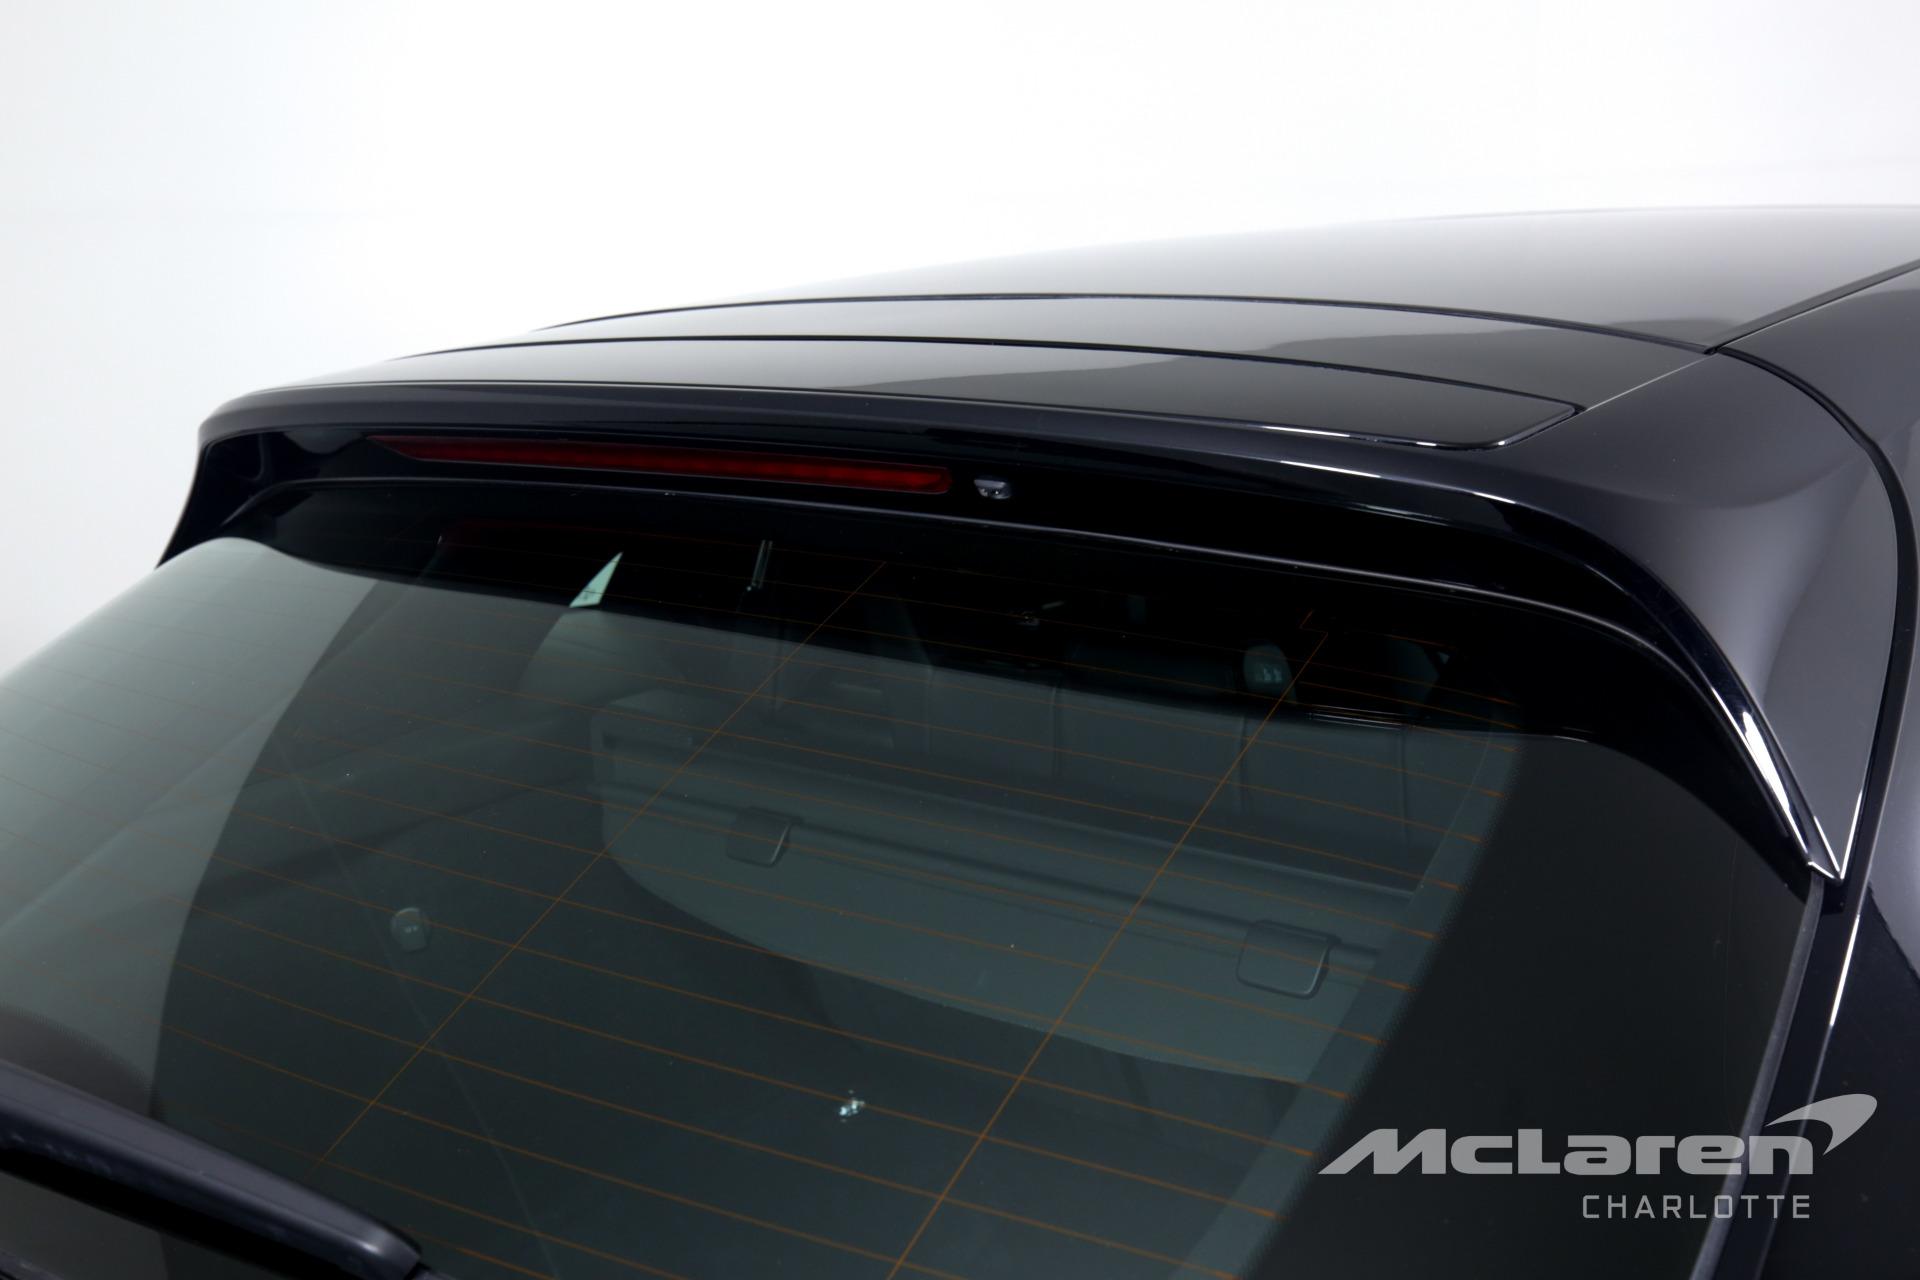 Used 2018 Porsche Panamera Turbo S E-Hybrid Sport Turismo | Charlotte, NC